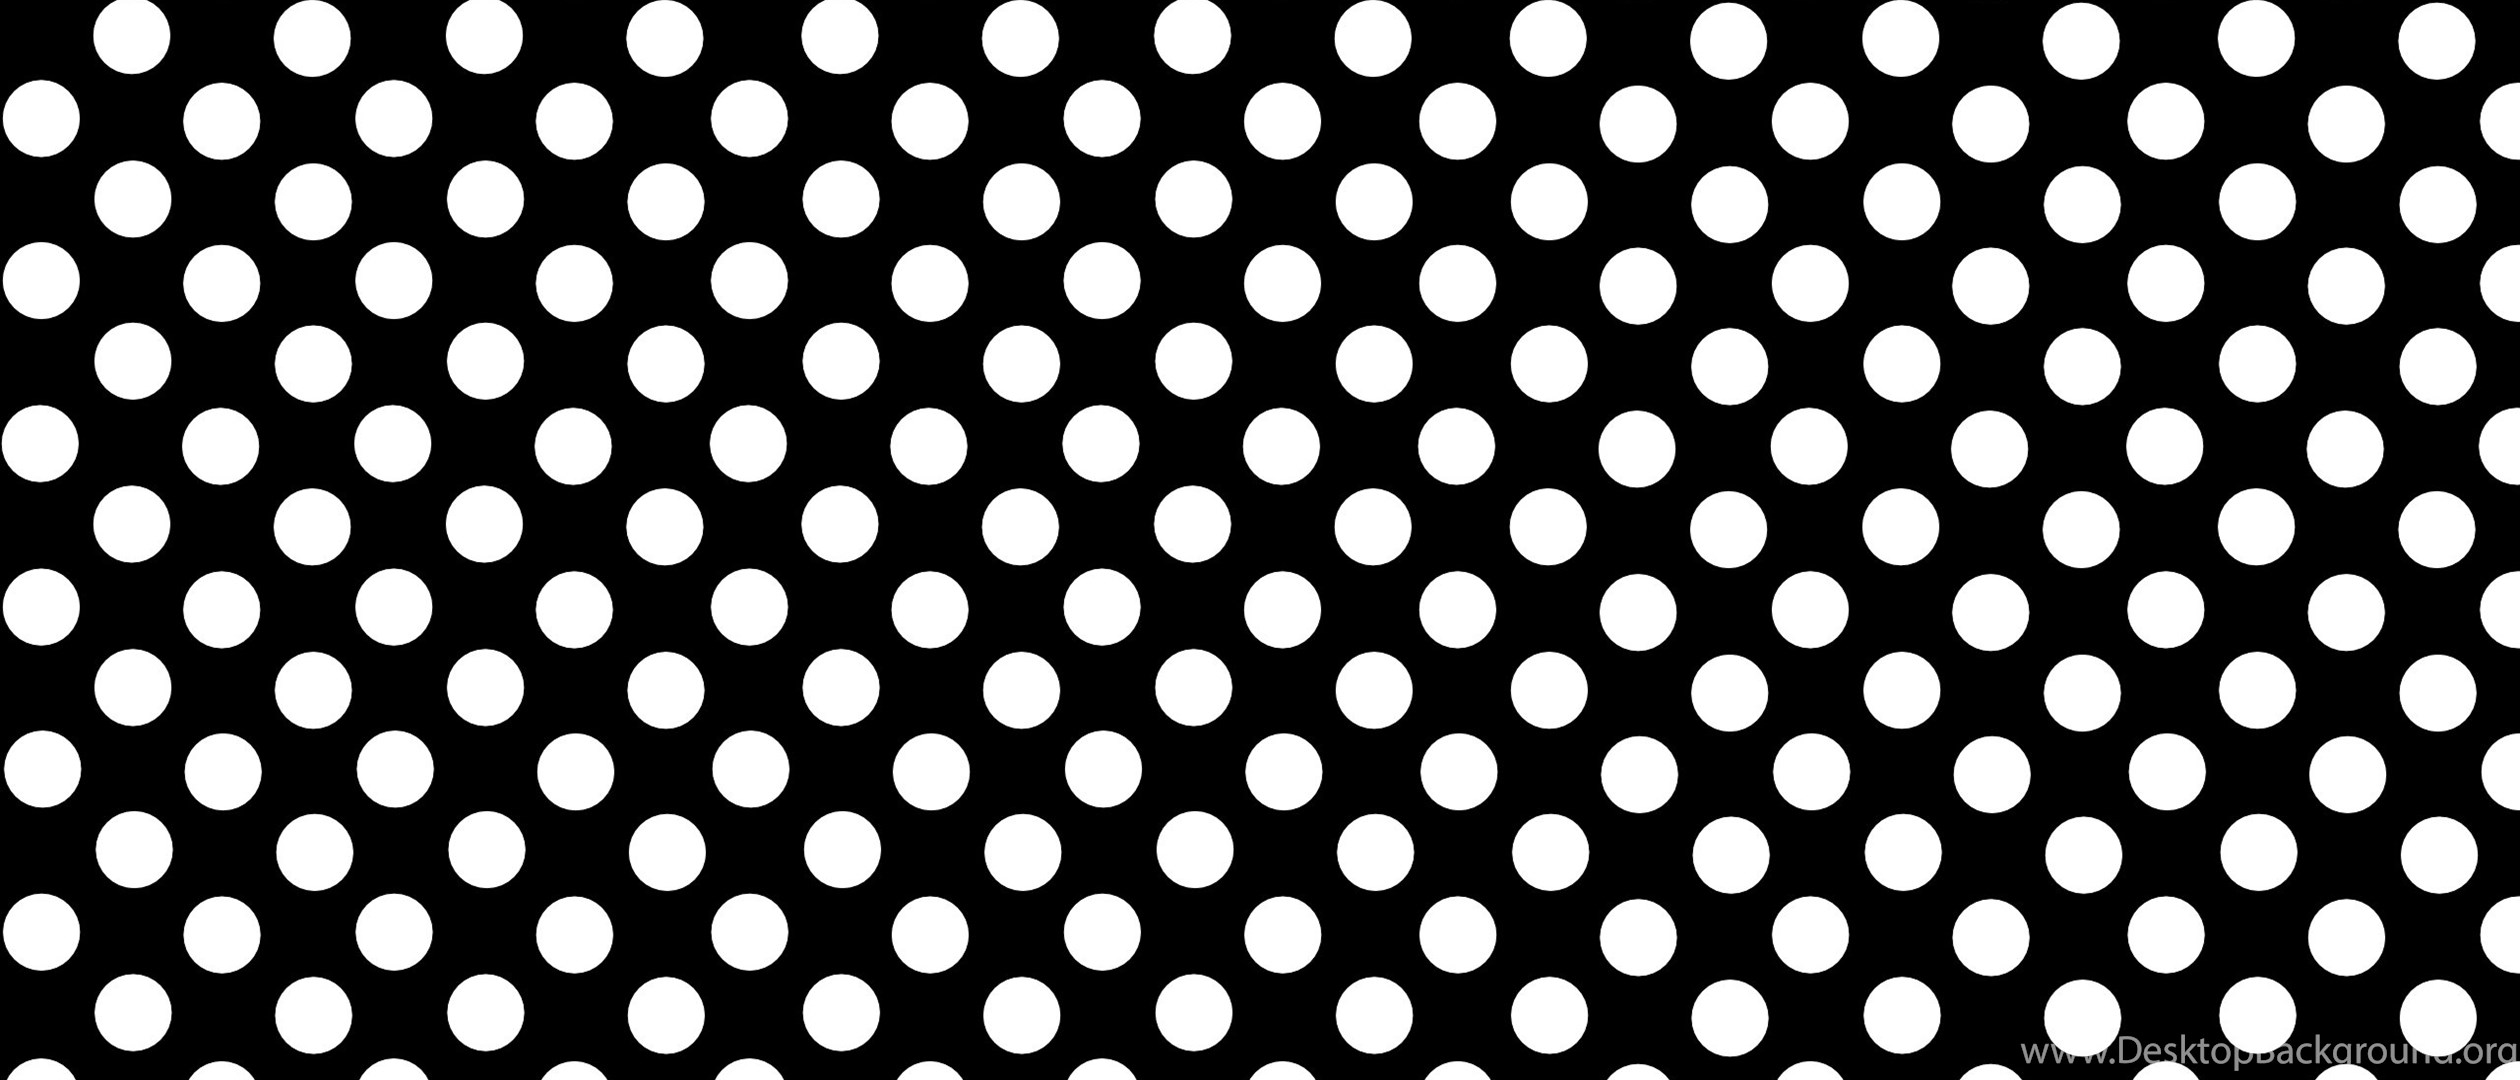 polka dot wallpapers border best hd wallpaper dots